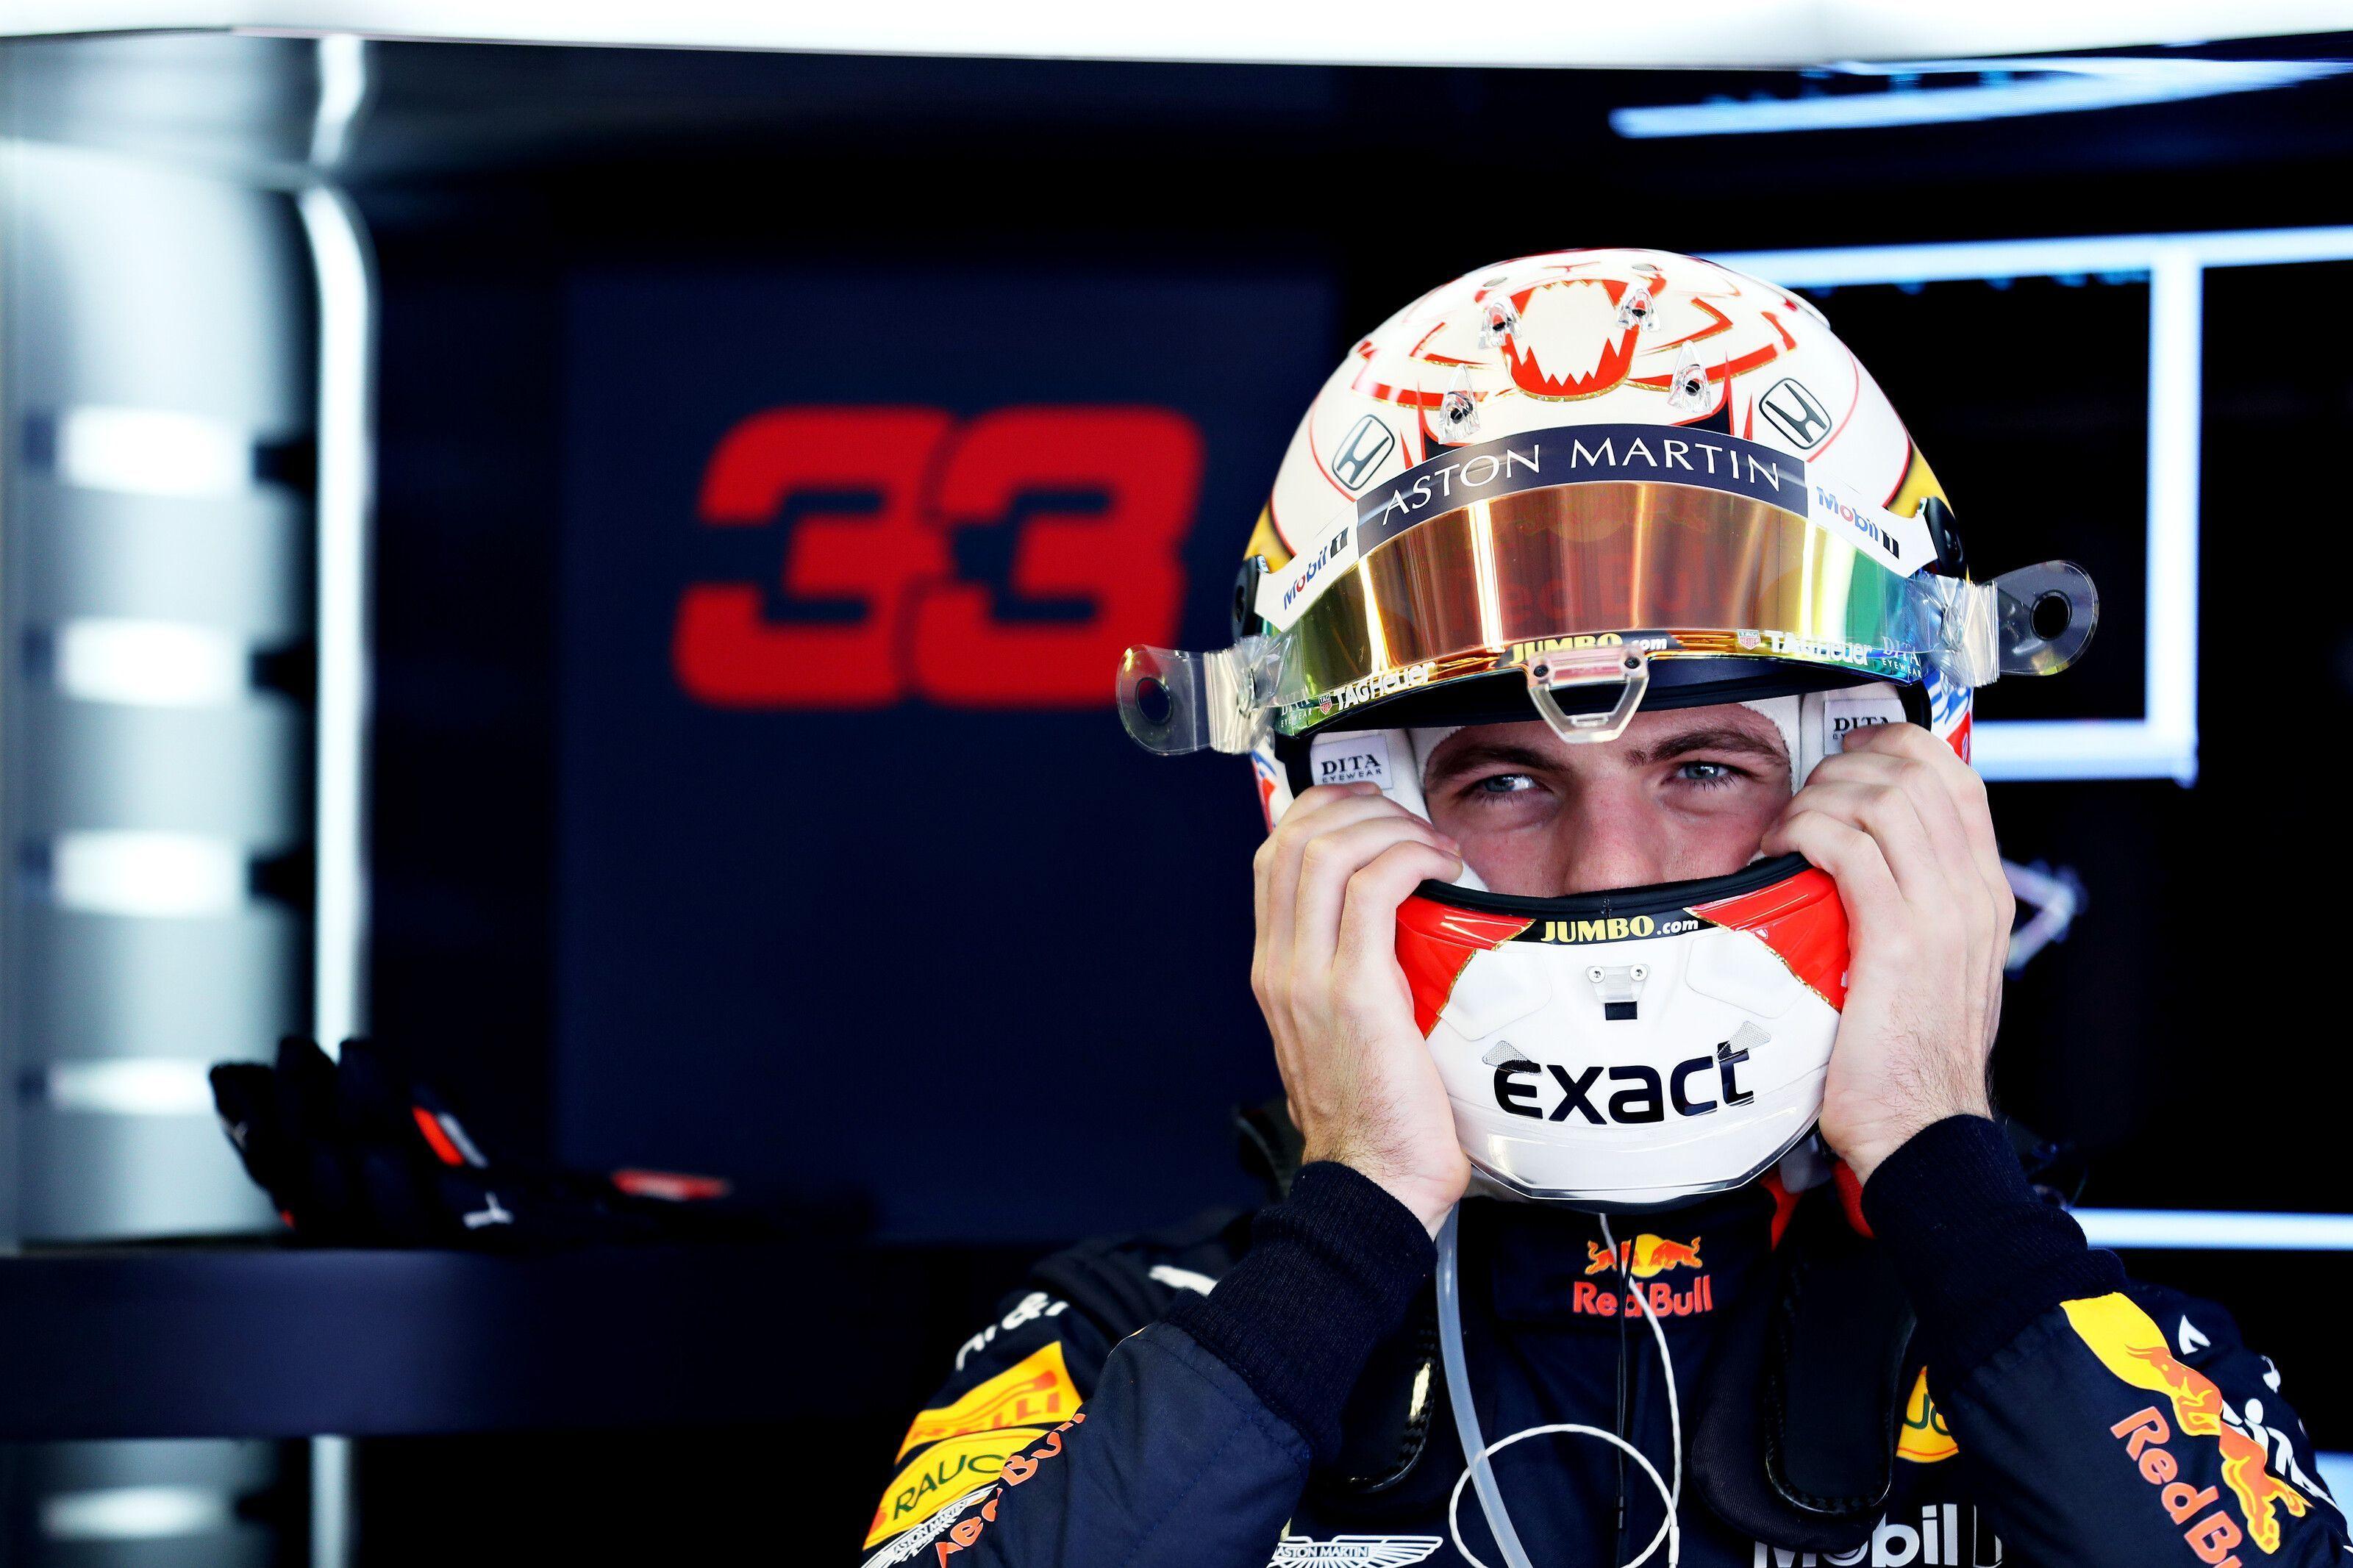 Max Verstappen, Fernando Alonso